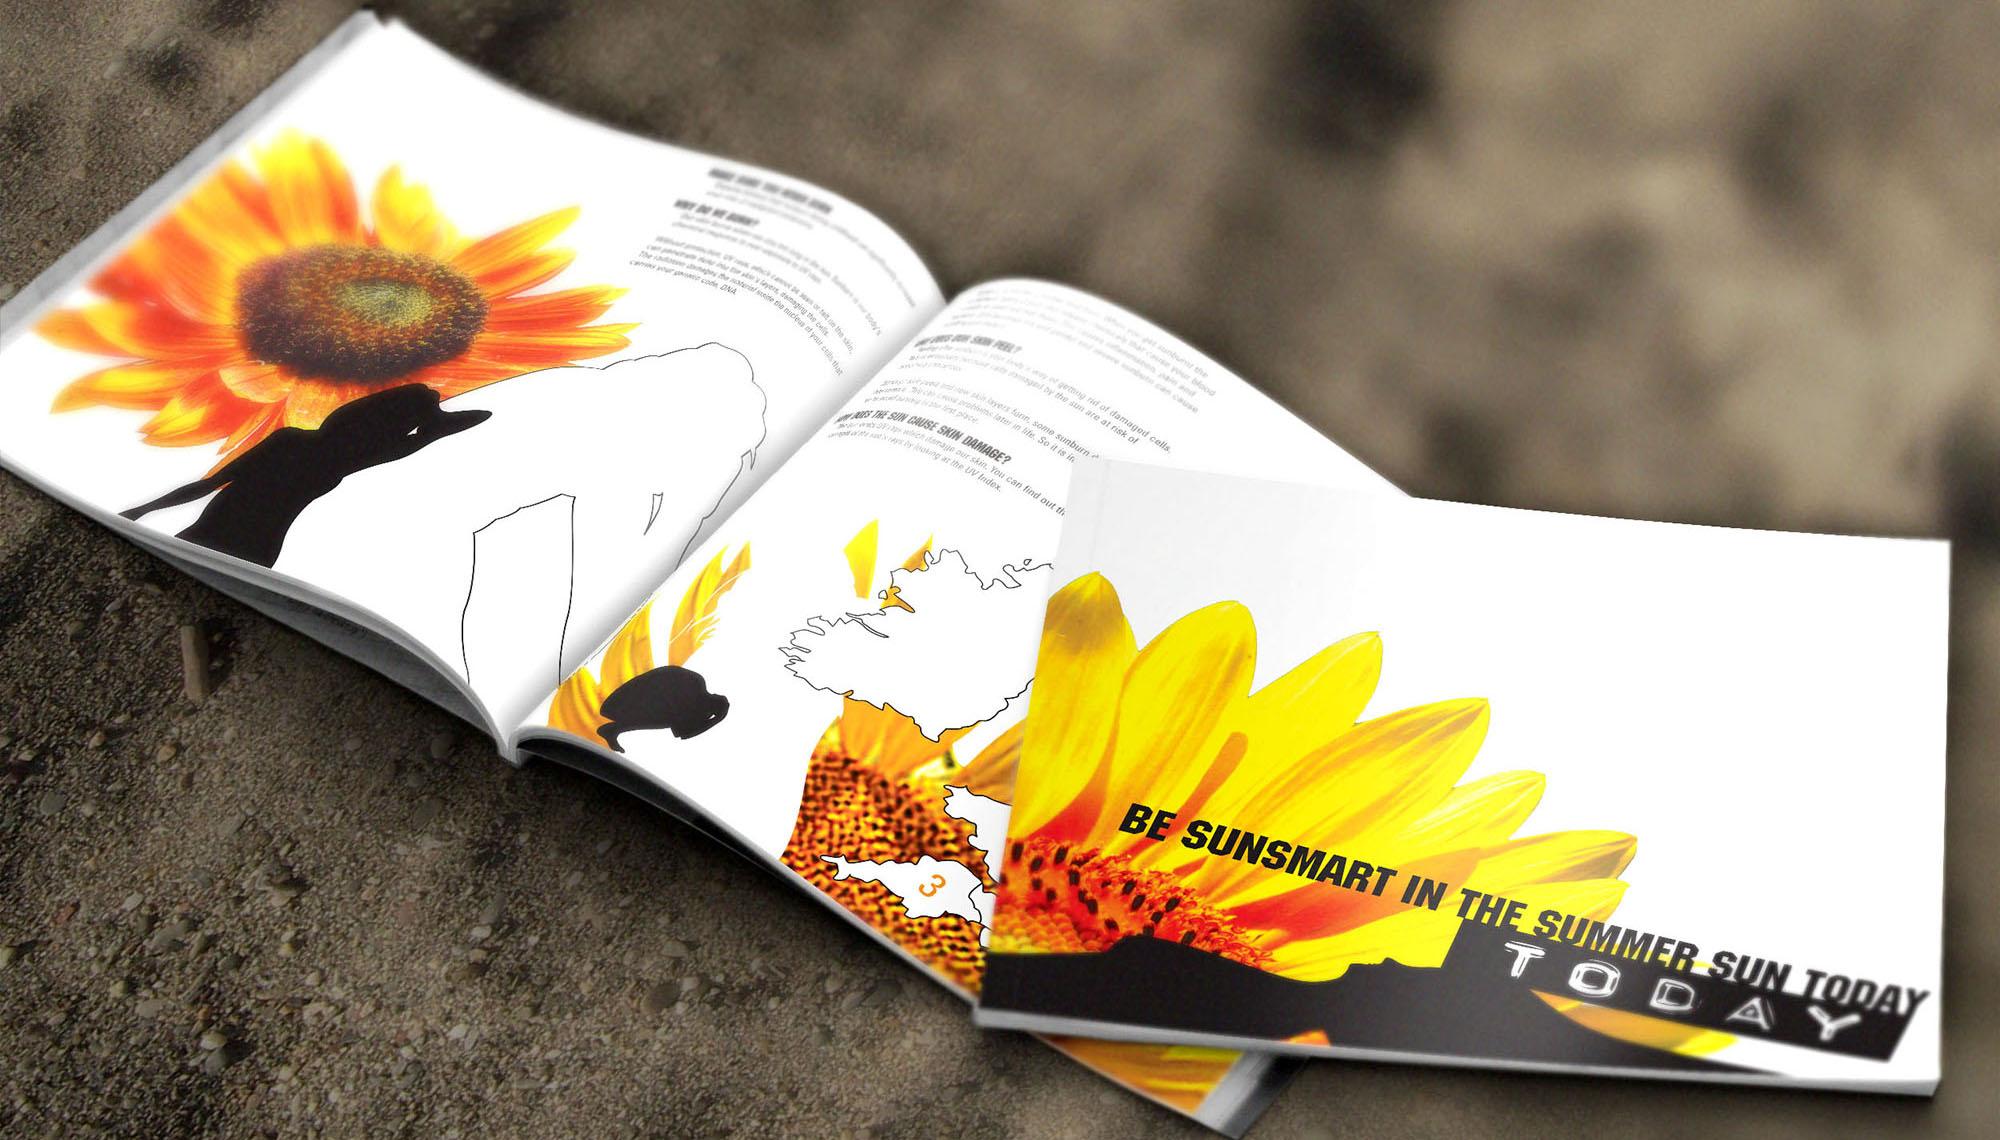 Cancer Research Brochure Design exposing dangers of sun exposure